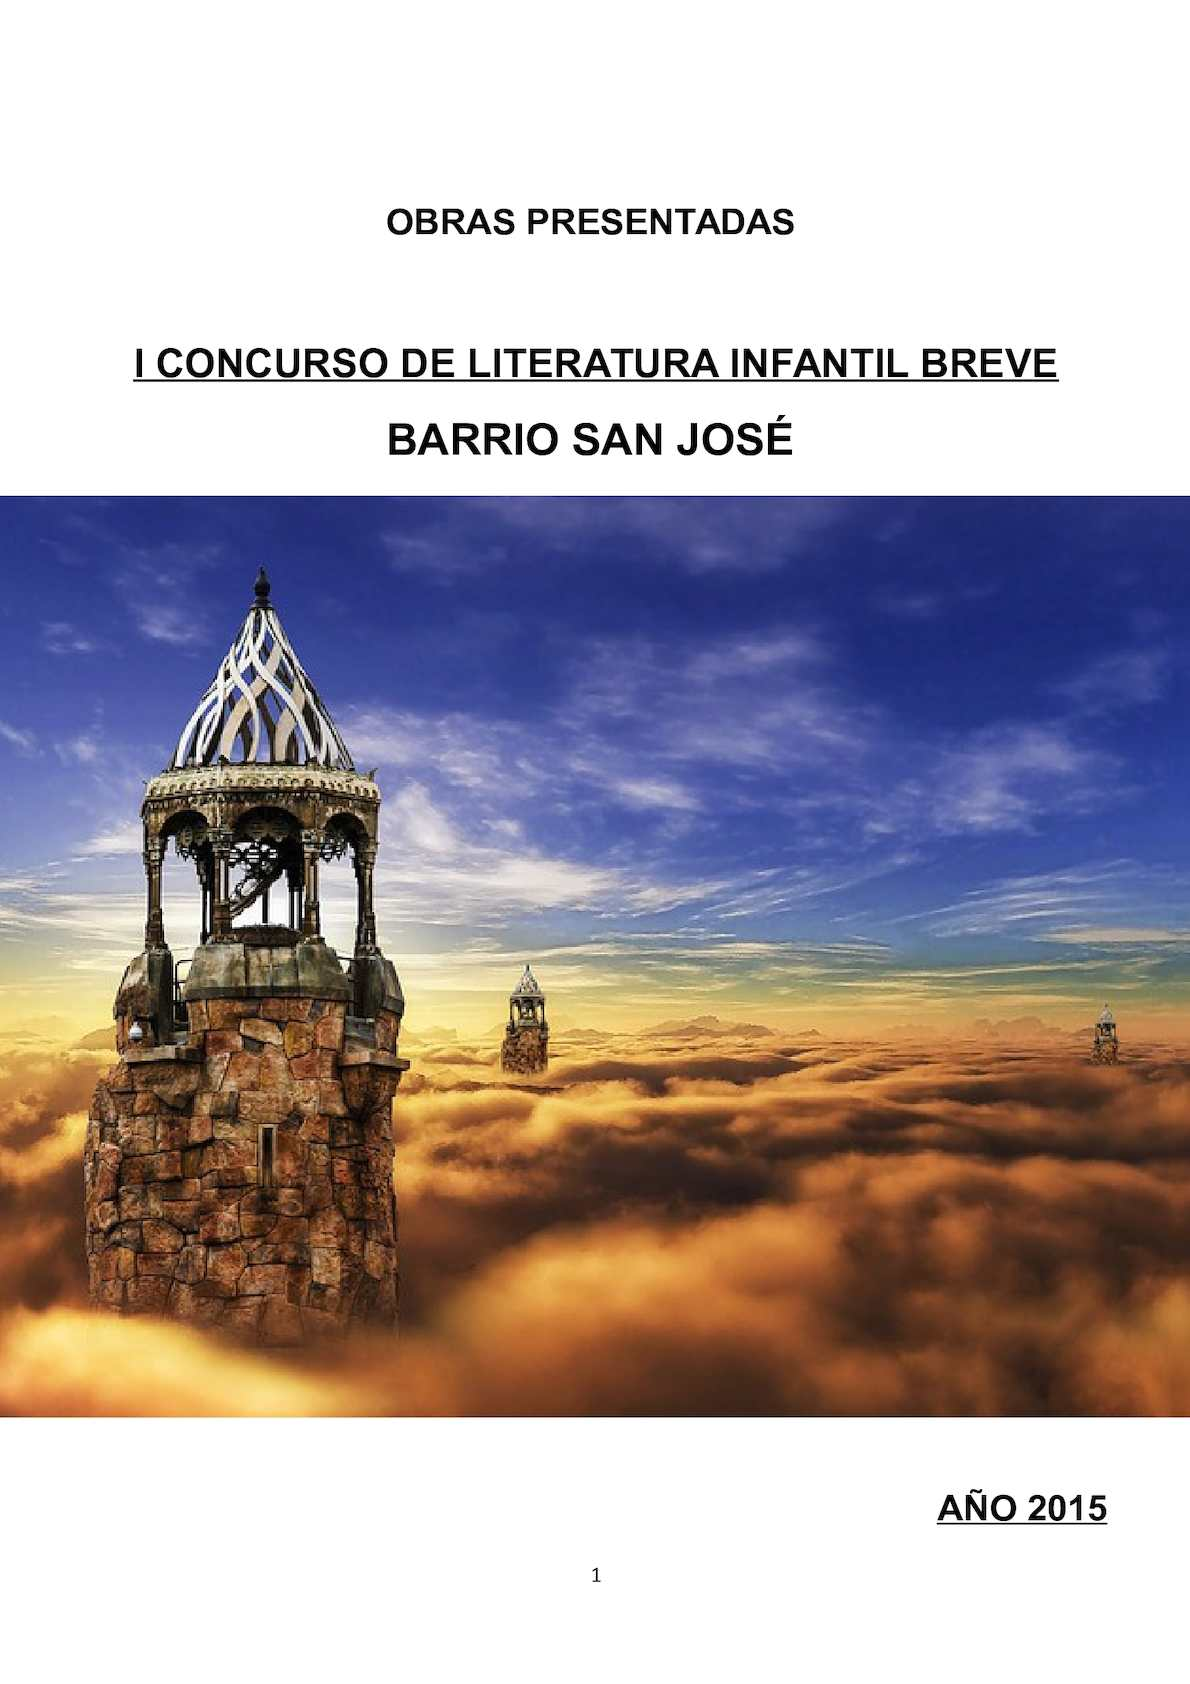 Calaméo - I CONCURSO LITERATURA INFANTIL BREVE SAN JOSE